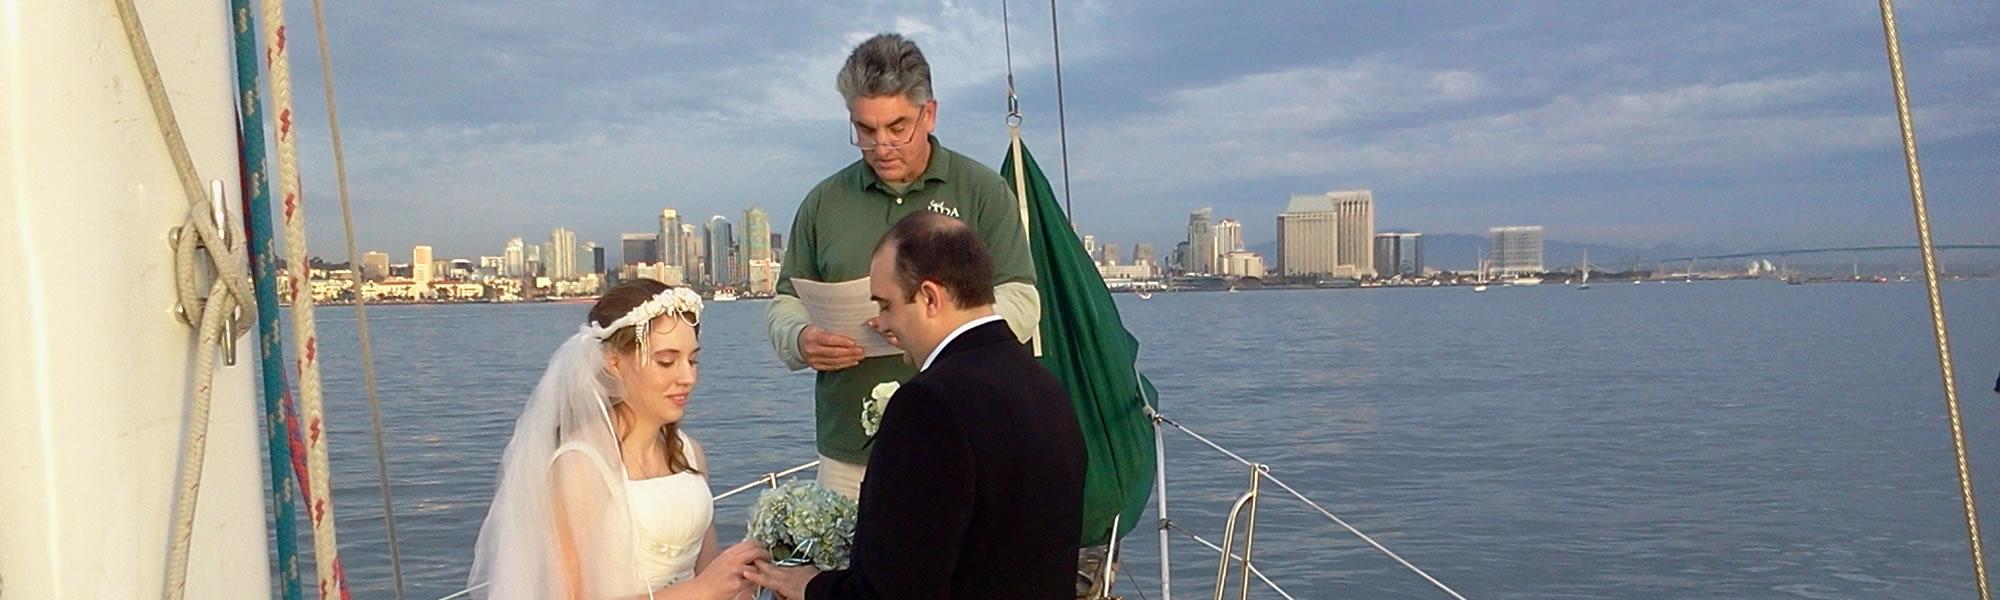 weddings at sea in san diego aboard JADA - classic wooden sailboat